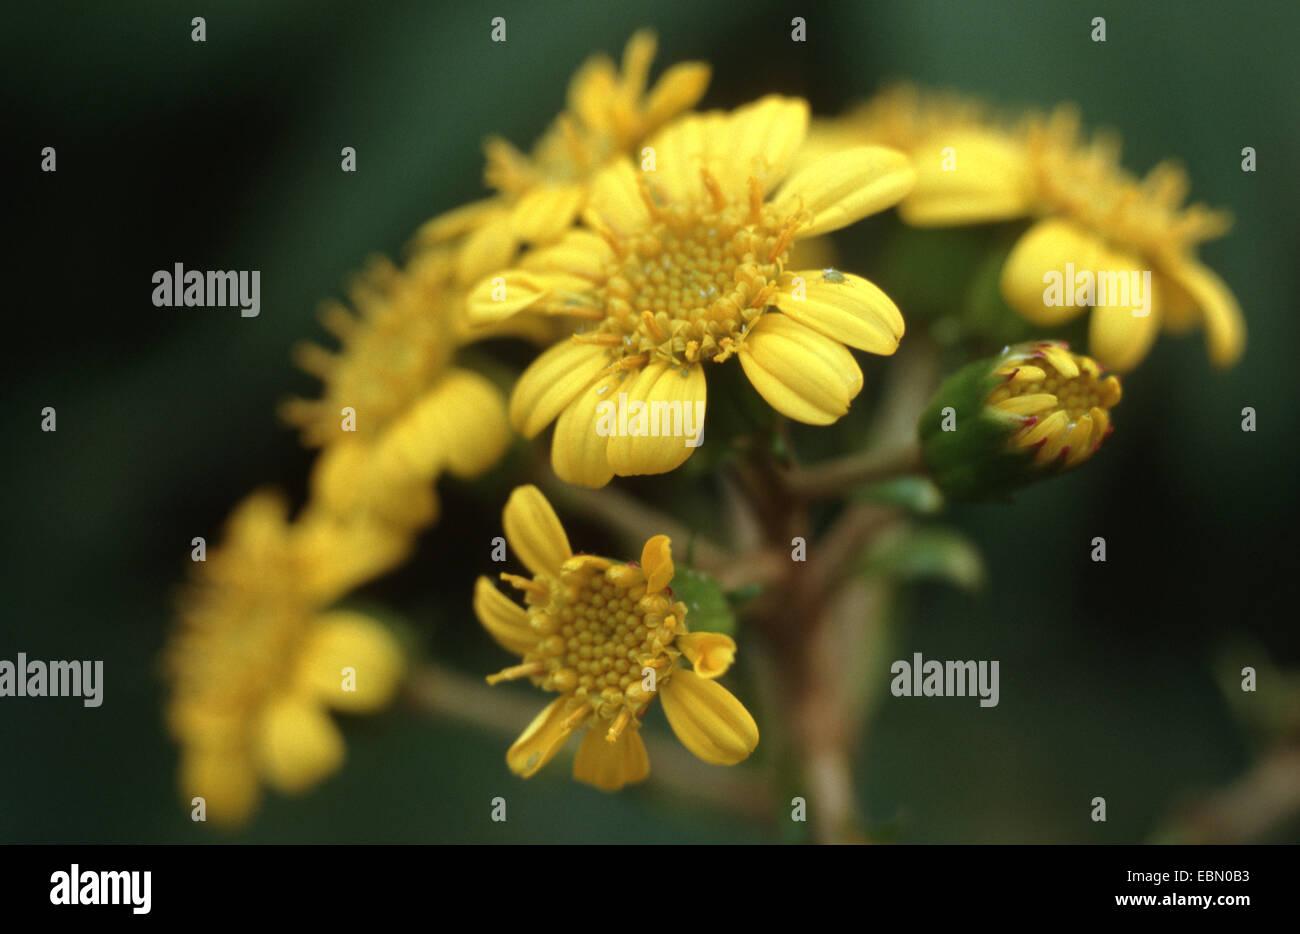 Leopard plant, Green leopard plant (Farfugium japonicum, Ligularia tussilaginea), blooming - Stock Image